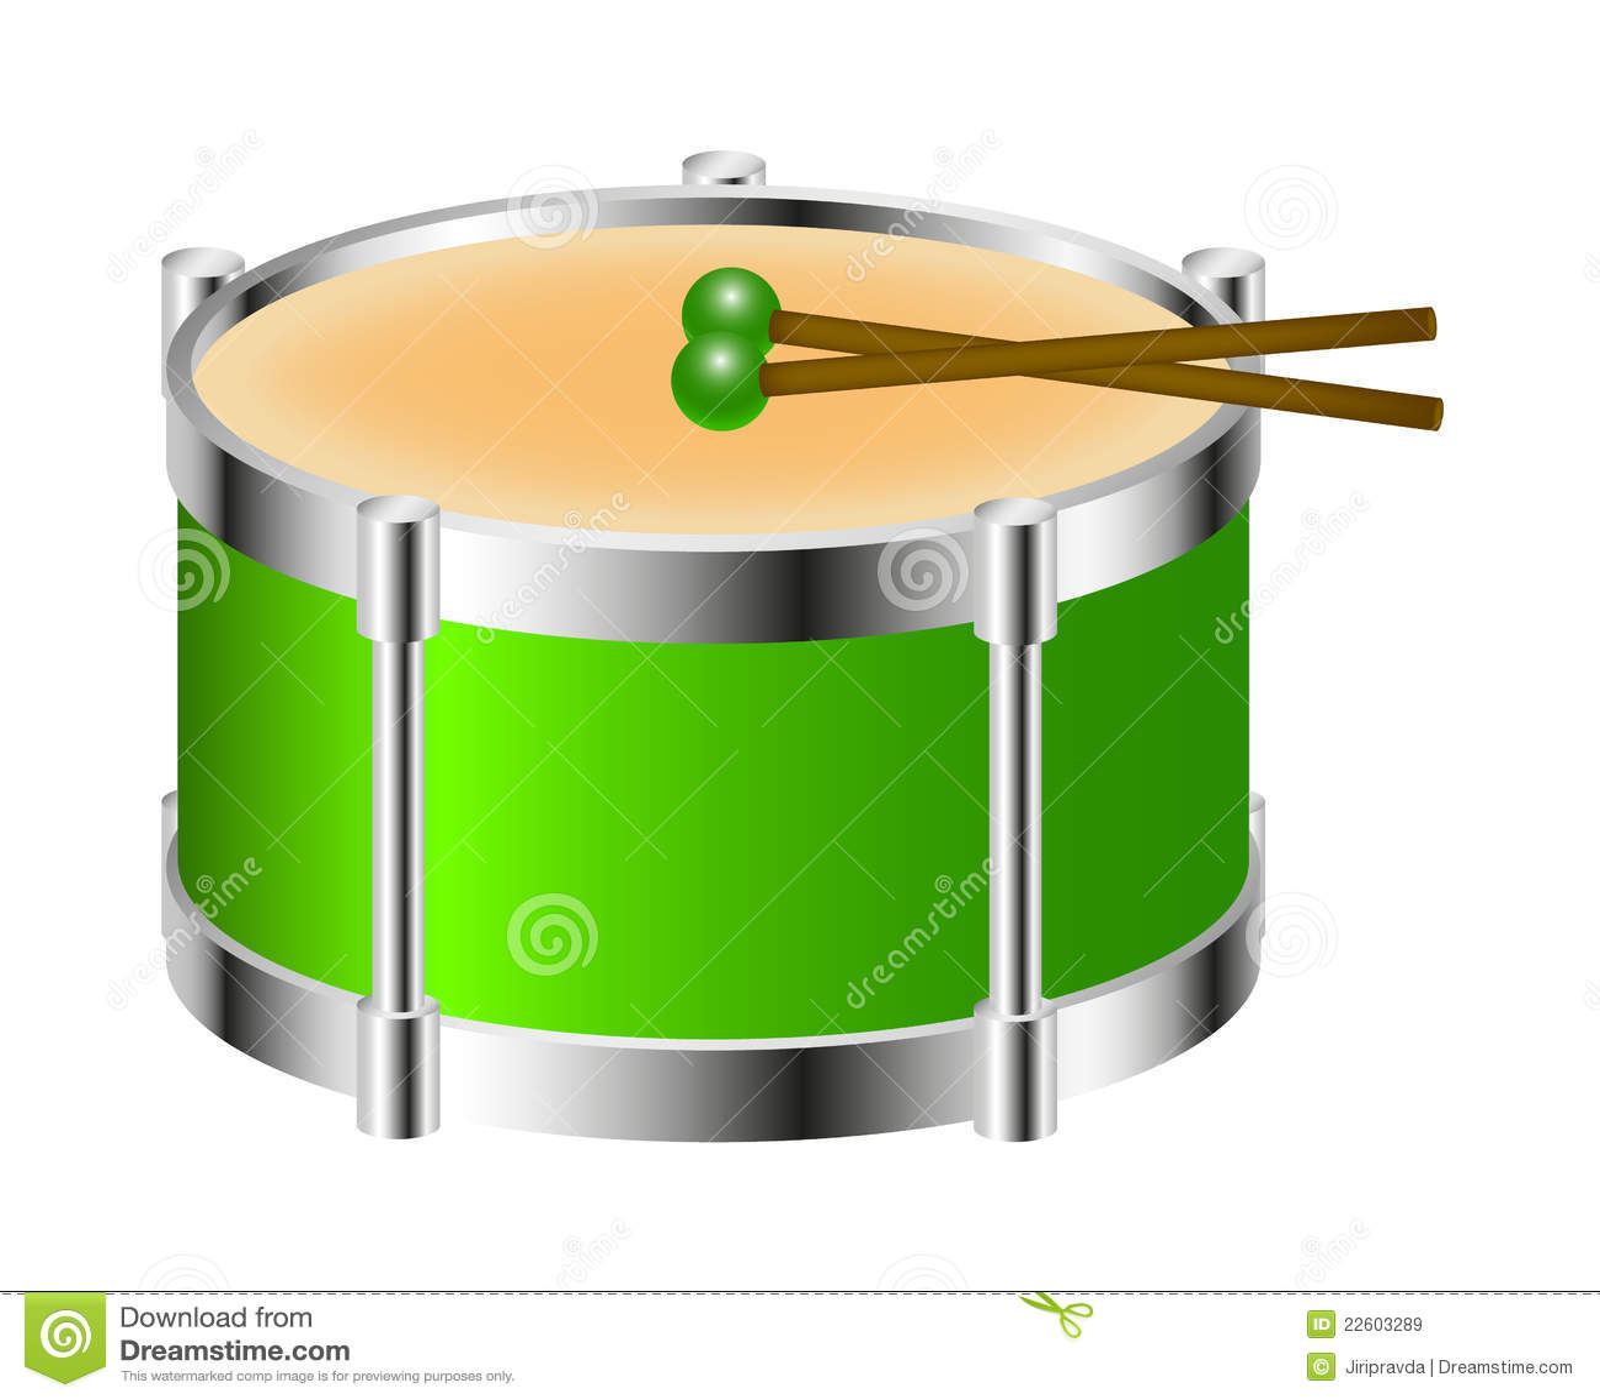 Drum Ring Vector